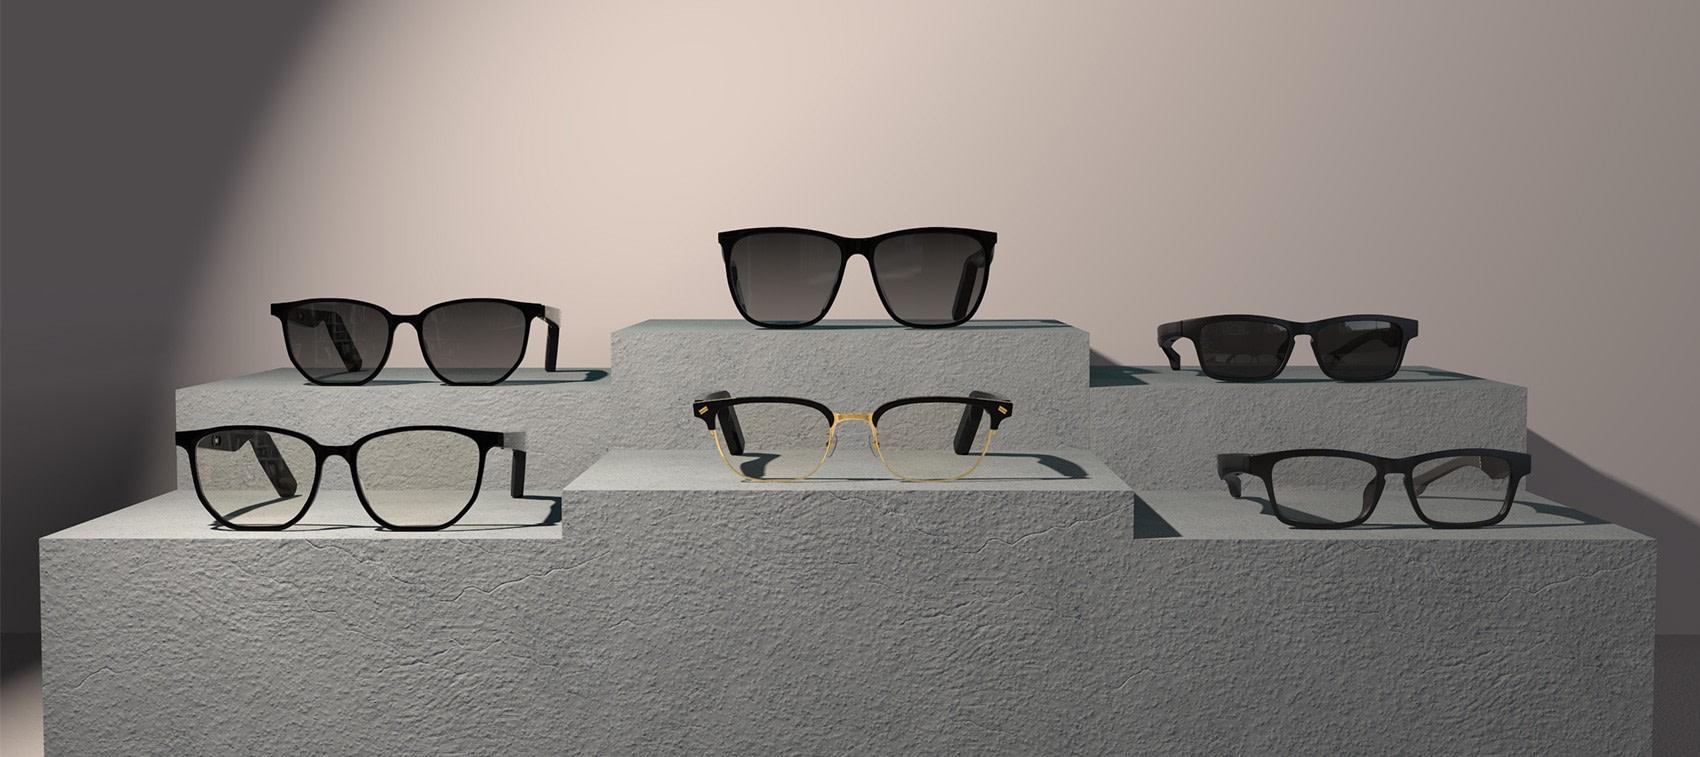 wide range of eyewear with wireless music